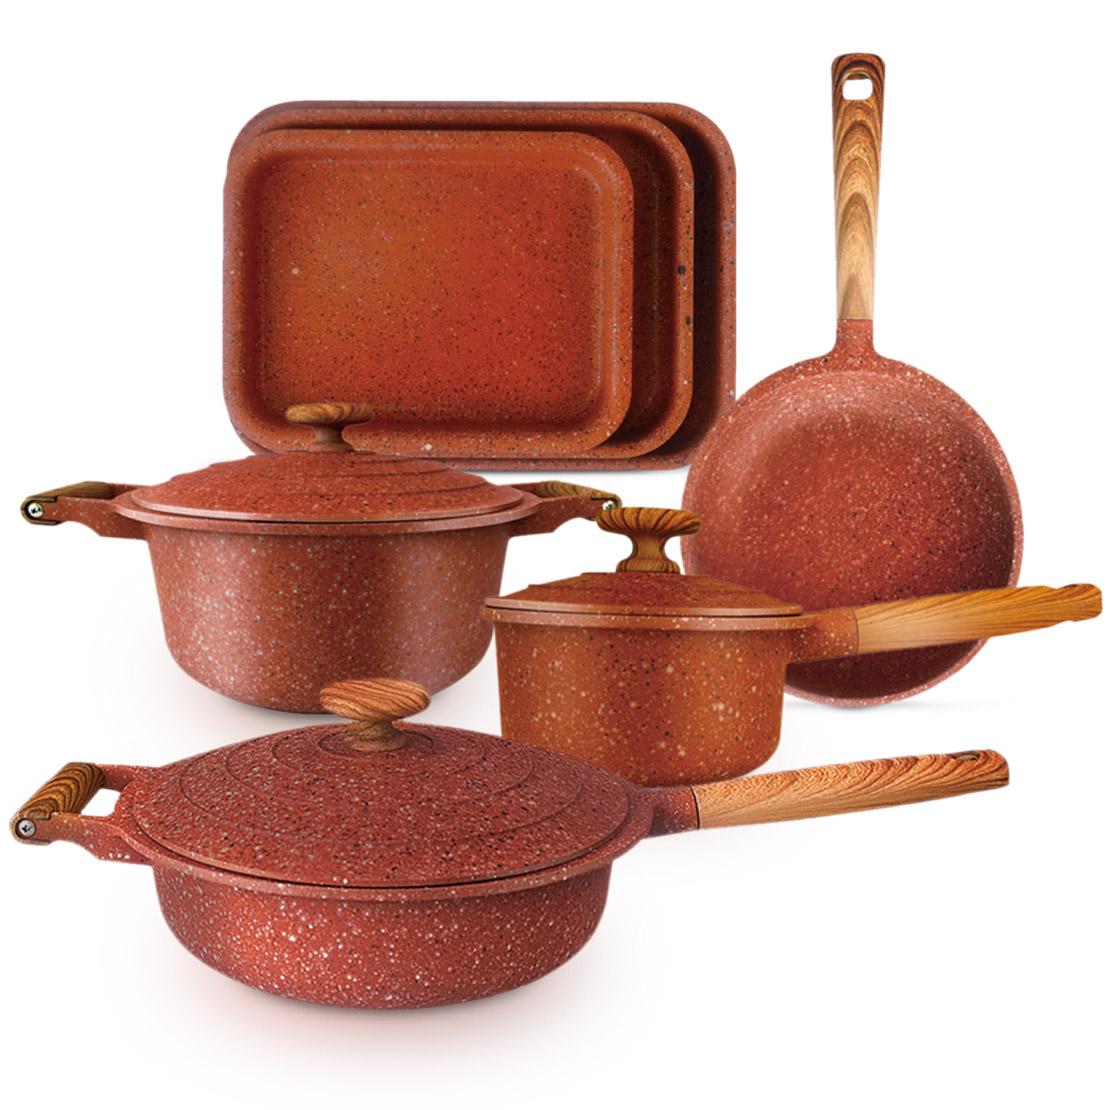 Cefrun Granite Cookware Set